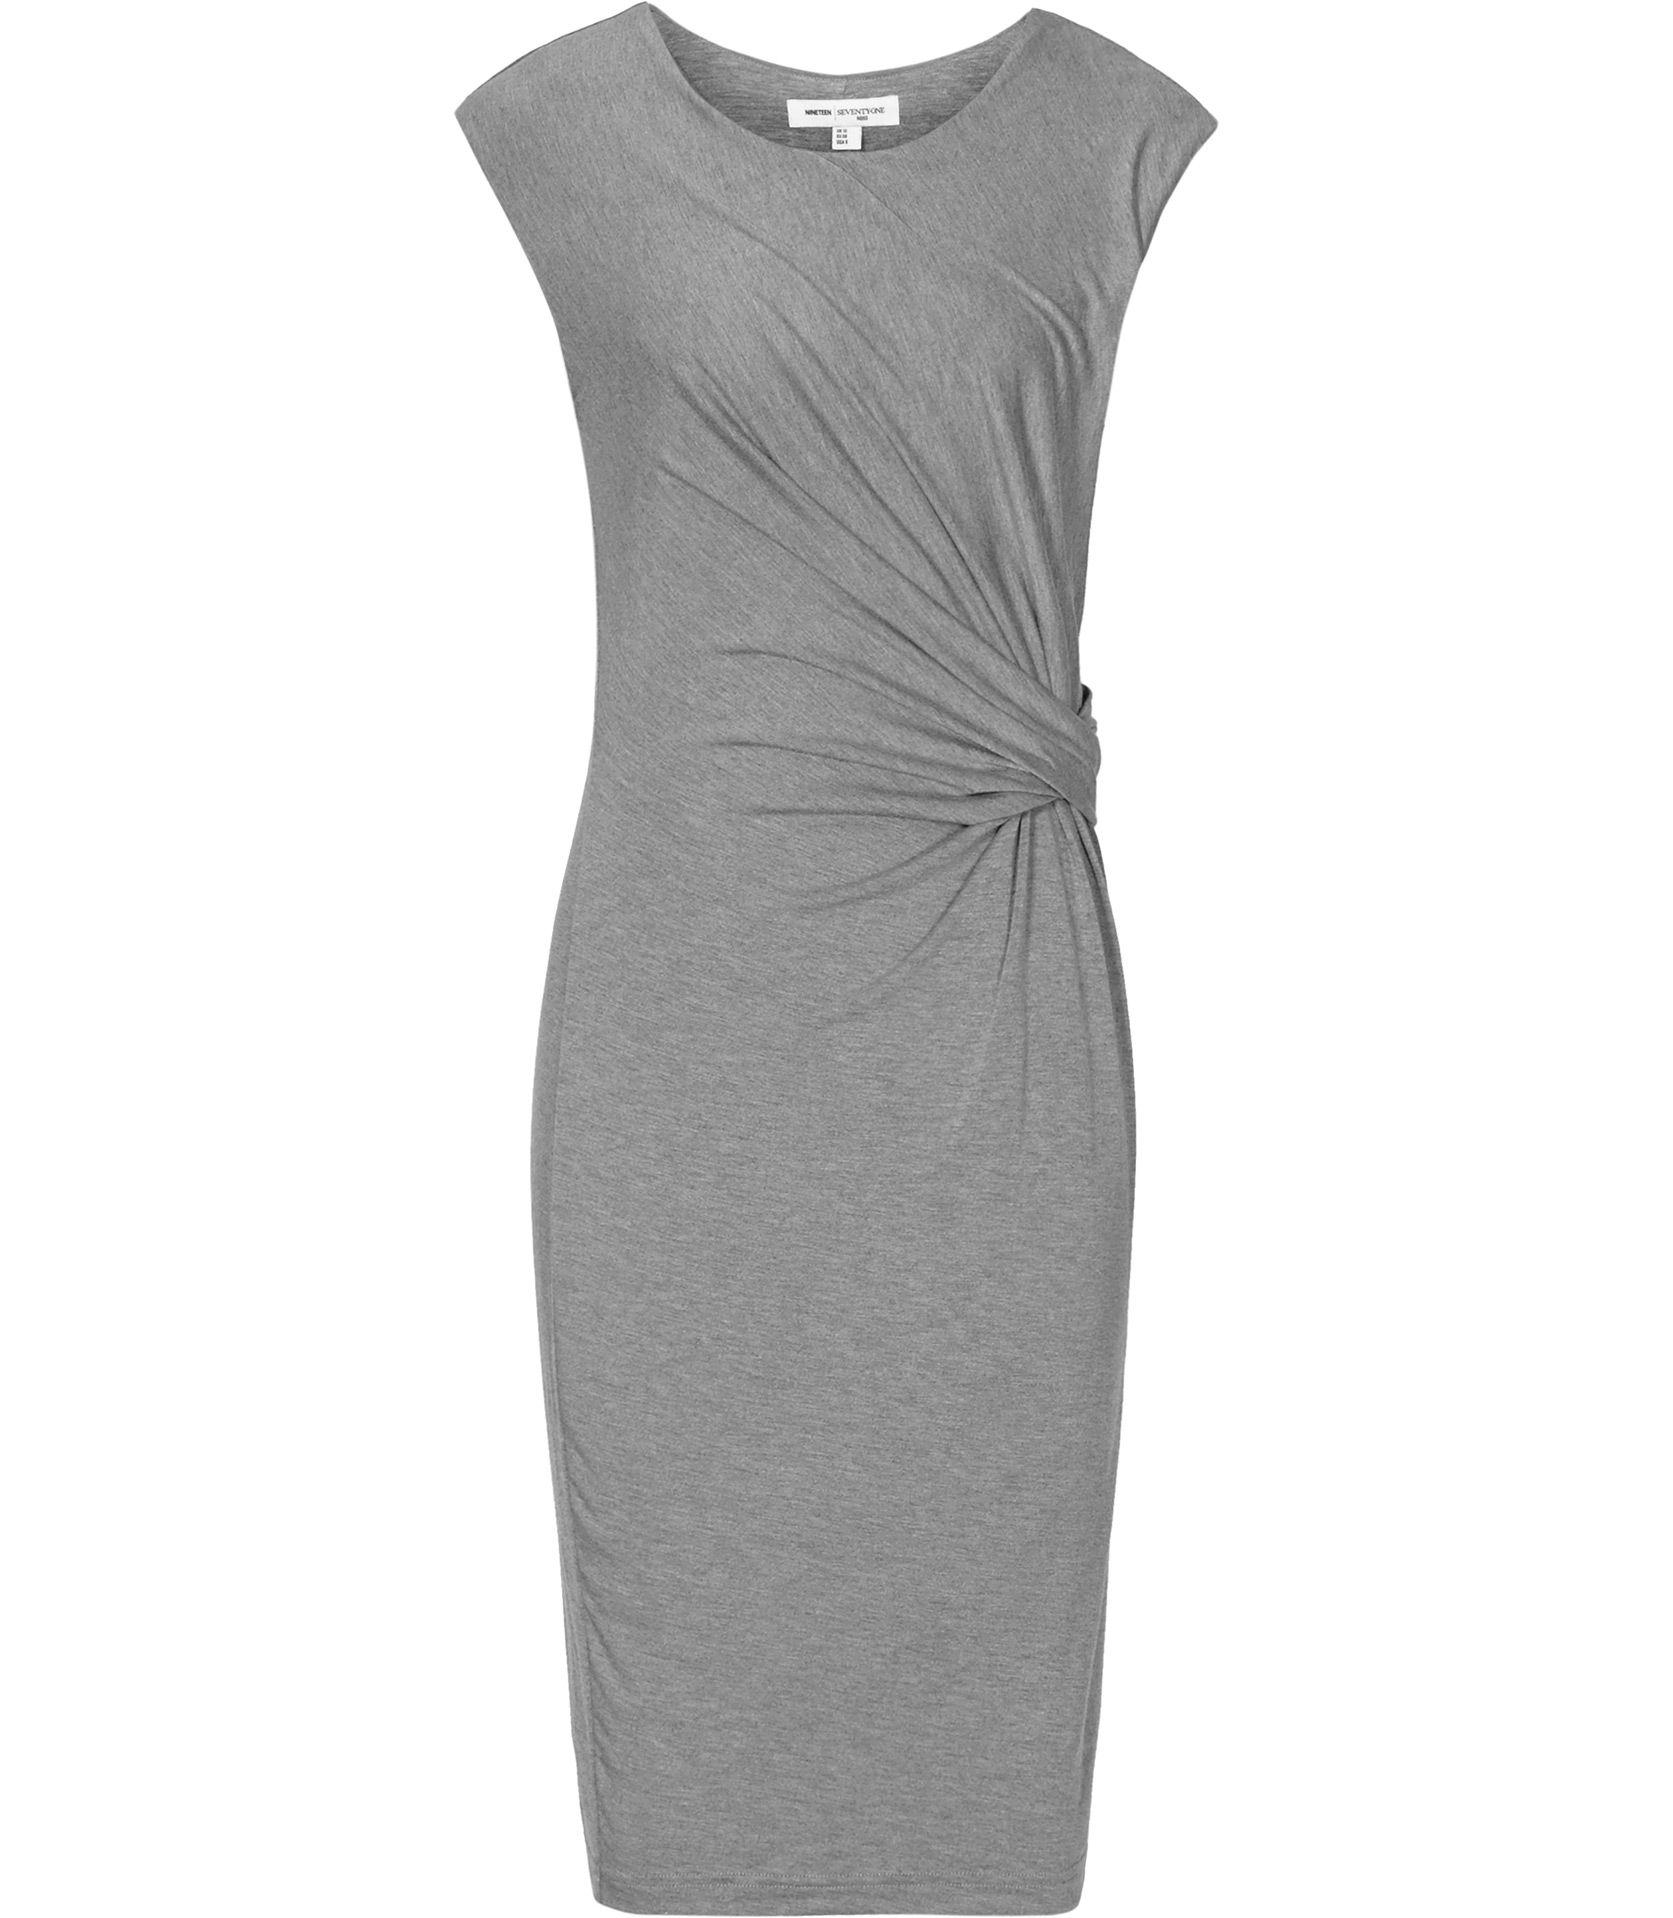 Reiss Costa Plain Grey Melange Wrap Dress